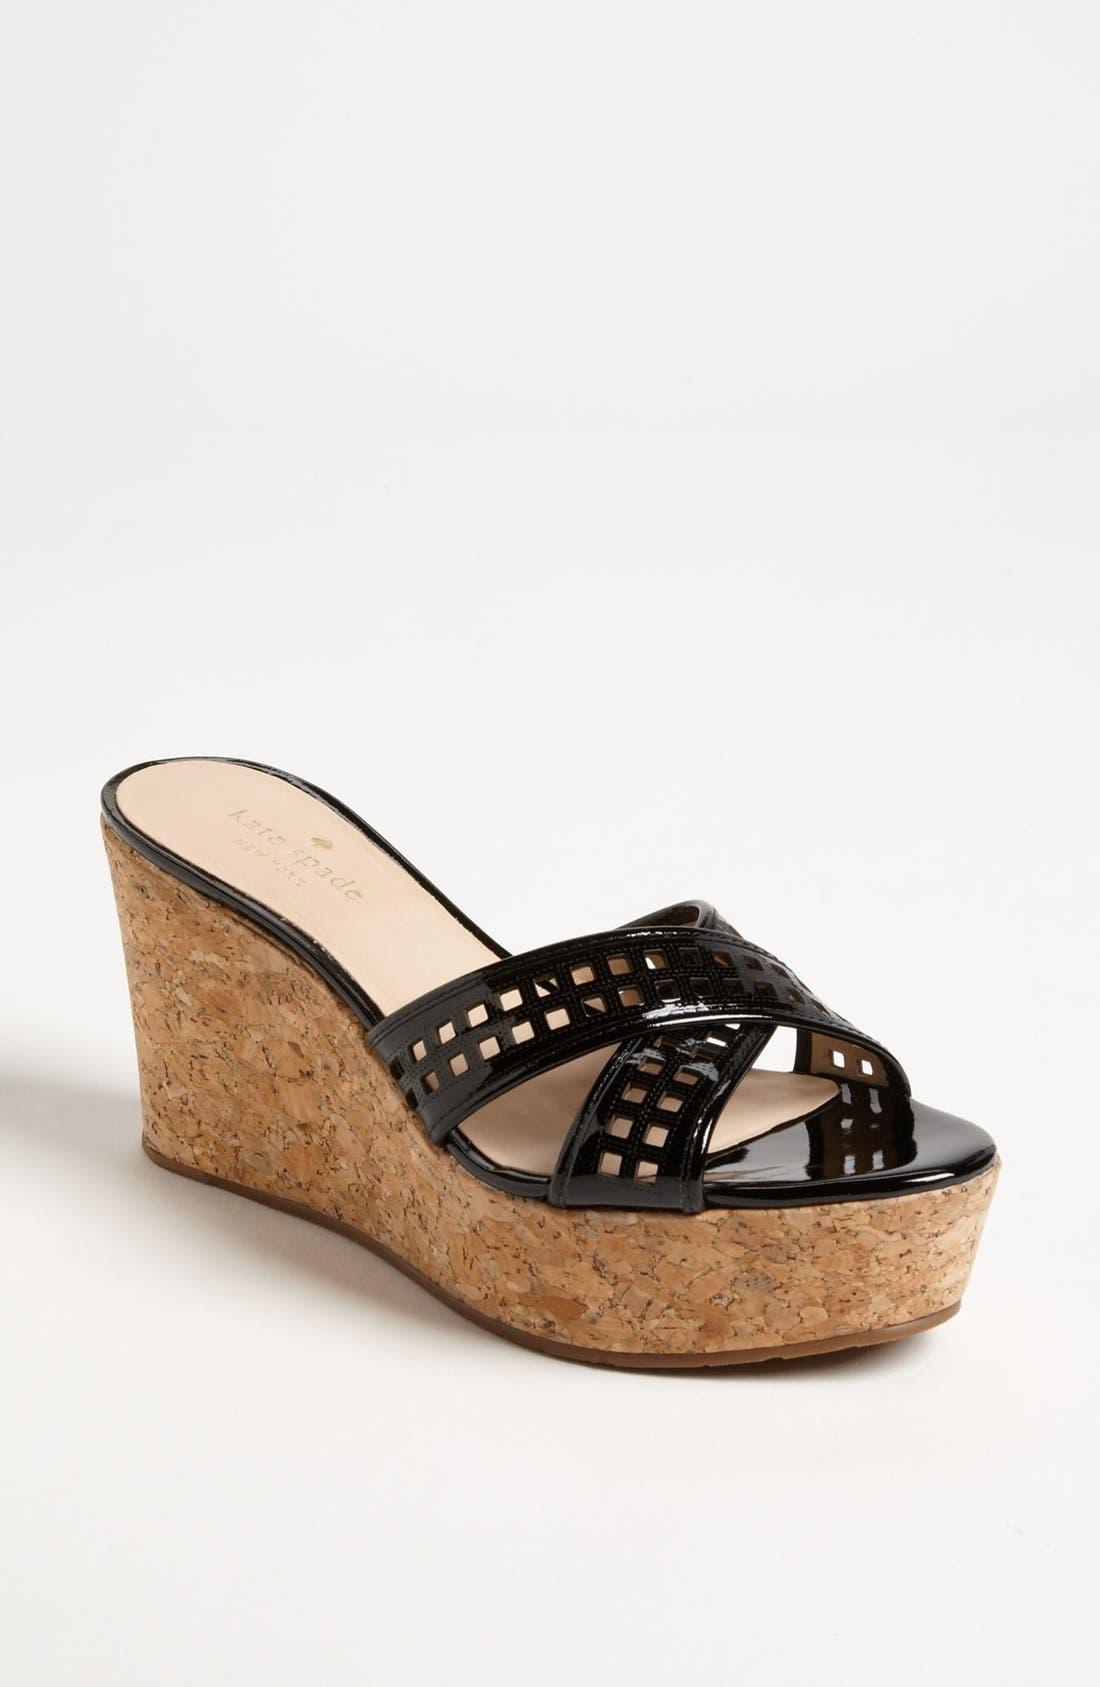 Alternate Image 1 Selected - kate spade new york 'tawny' sandal